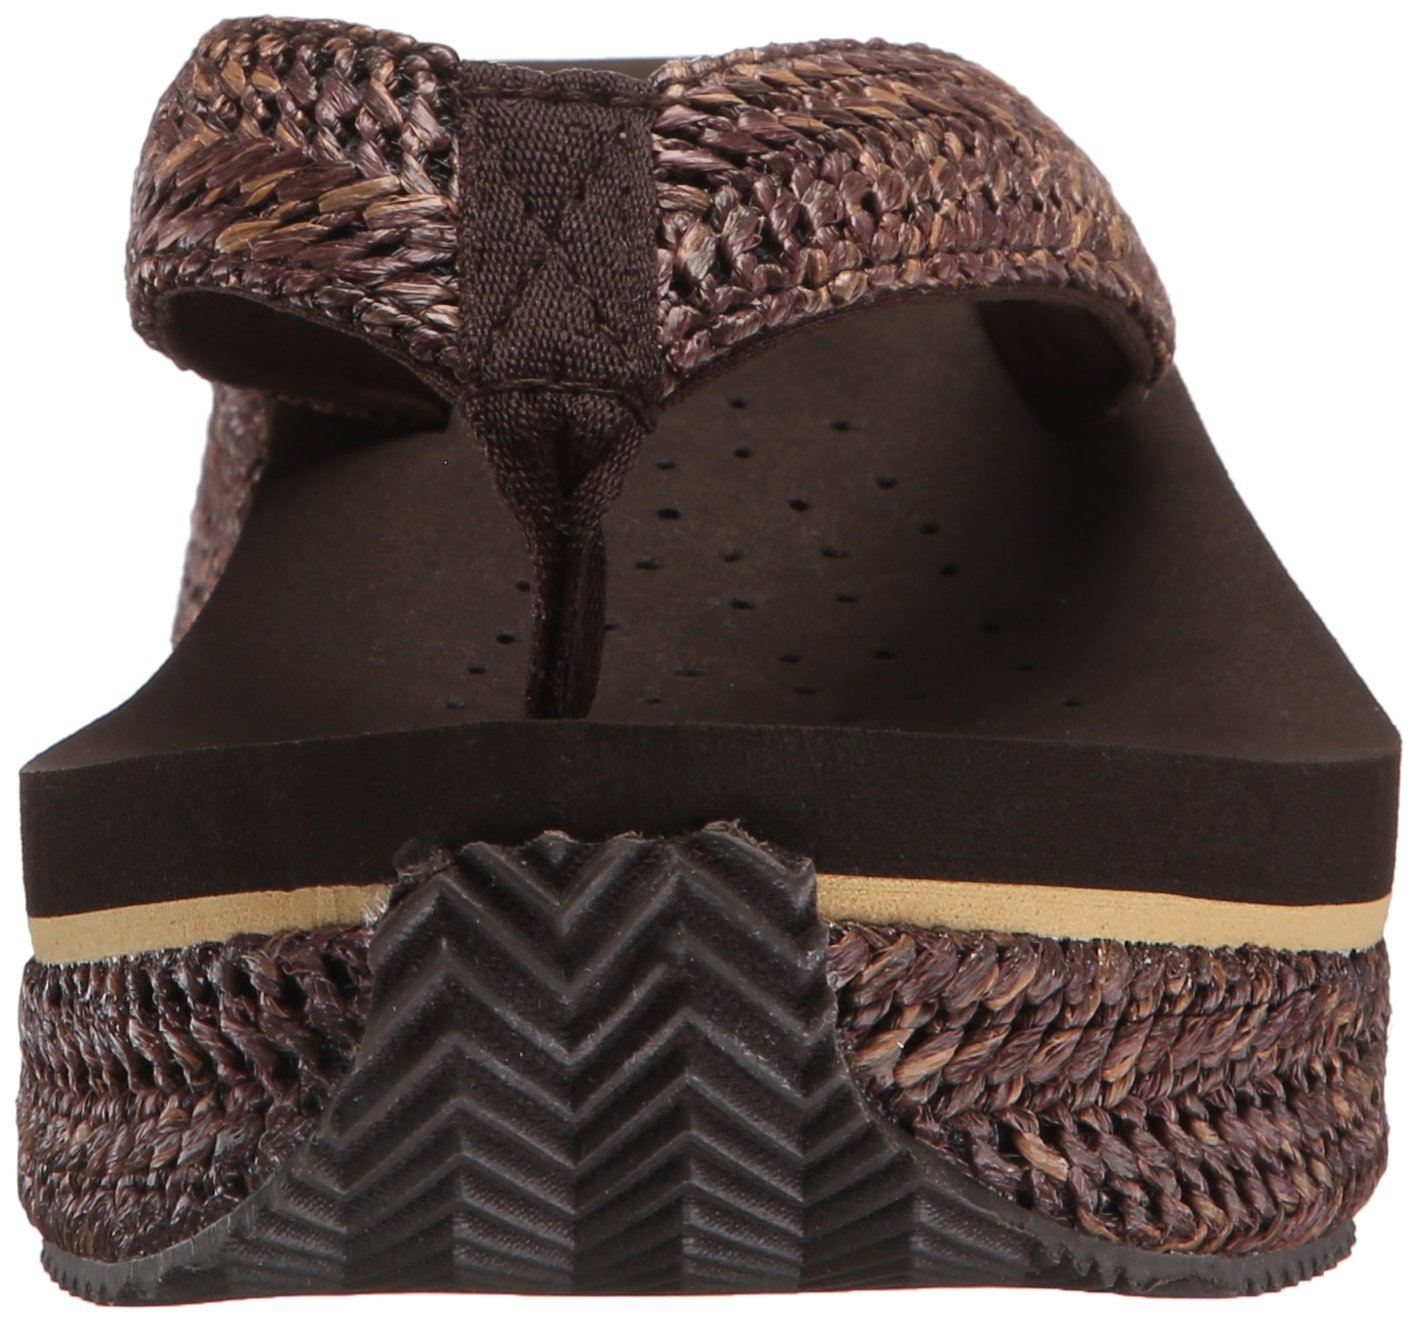 Volatile Women's Marine Wedge Sandal B00Y5JF4ZS 9 B(M) US|Brown